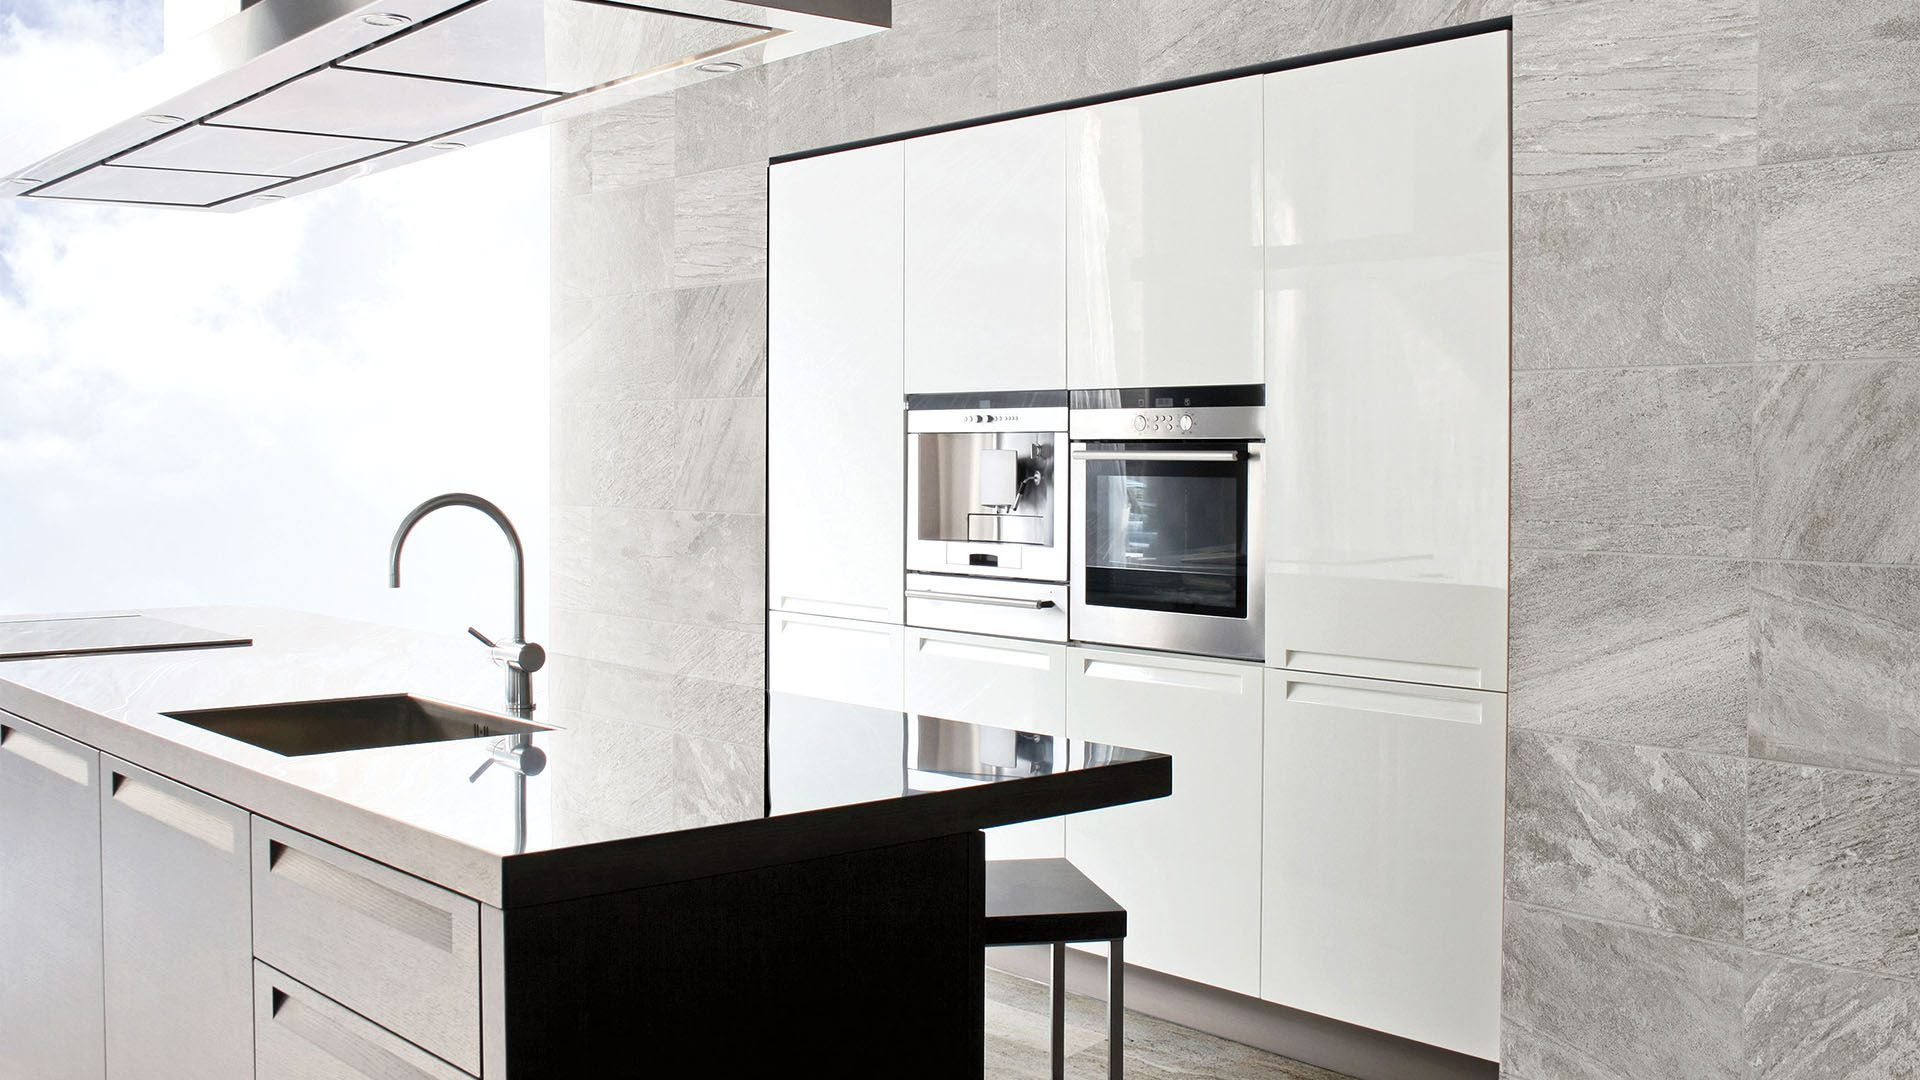 69-442-12x24-quarzo-argento-lifestyle-1920x1080.jpg